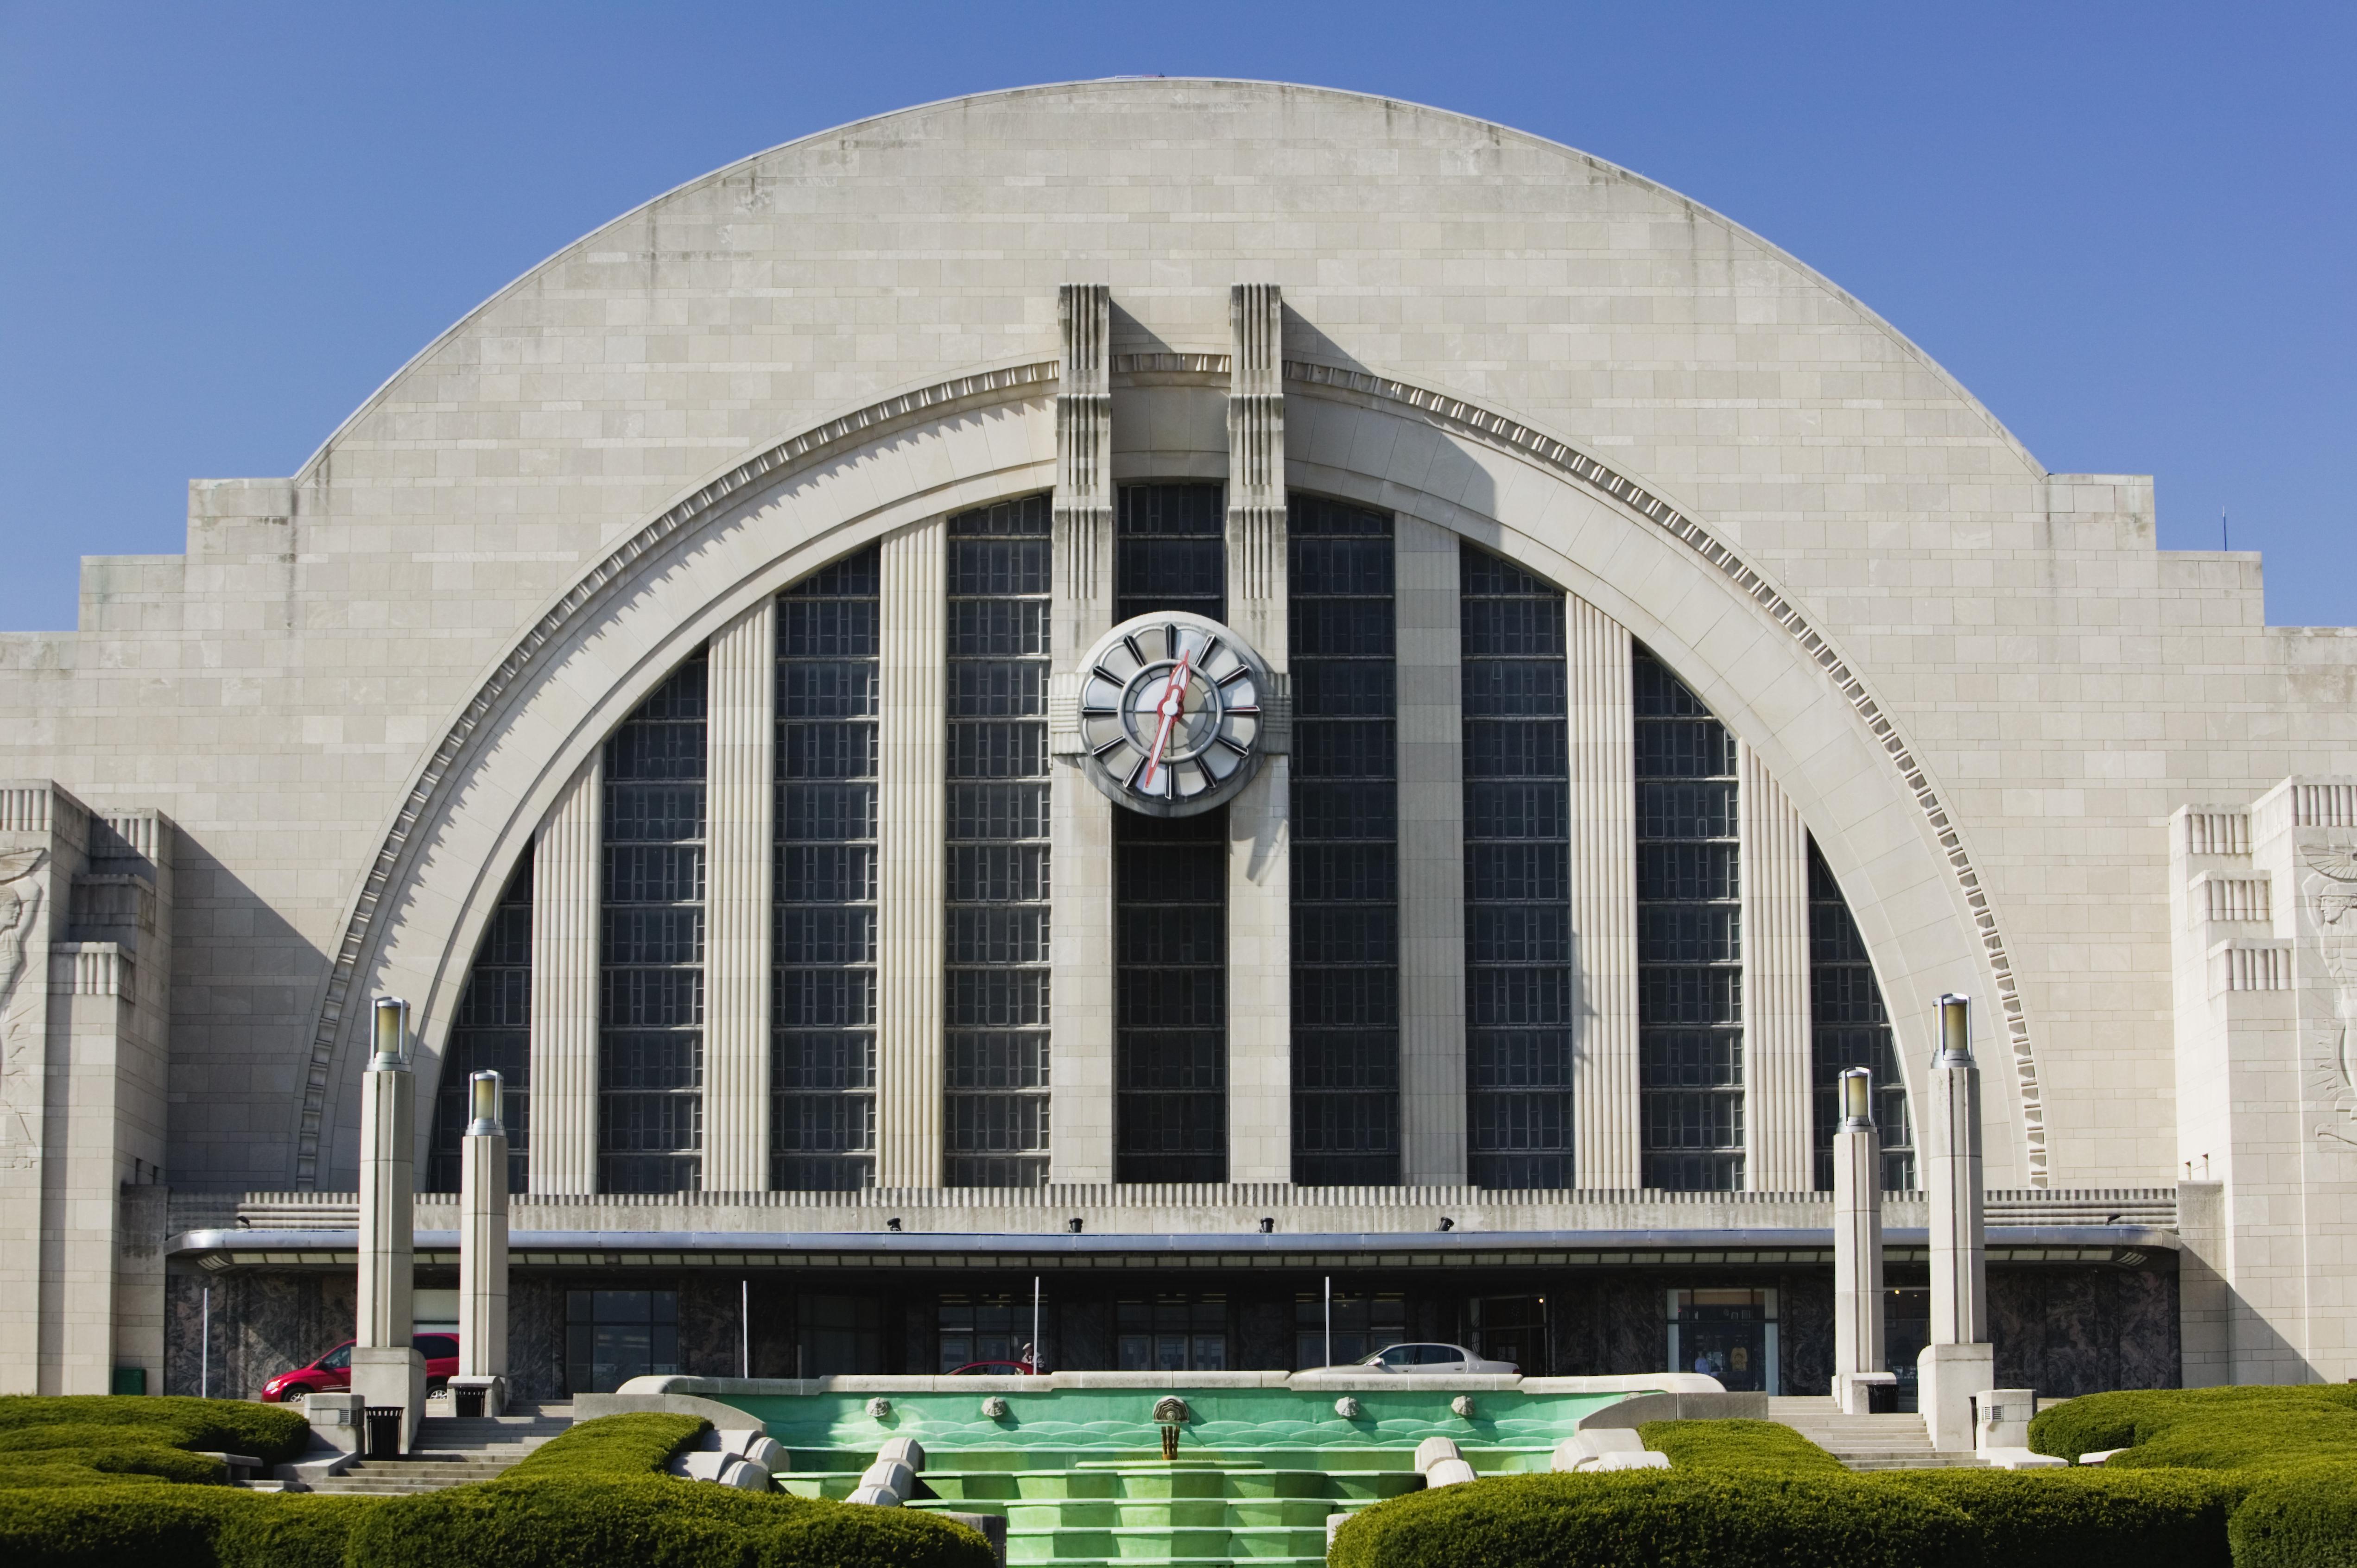 Cincinnati Museum Center at Union Terminal (b.1933)